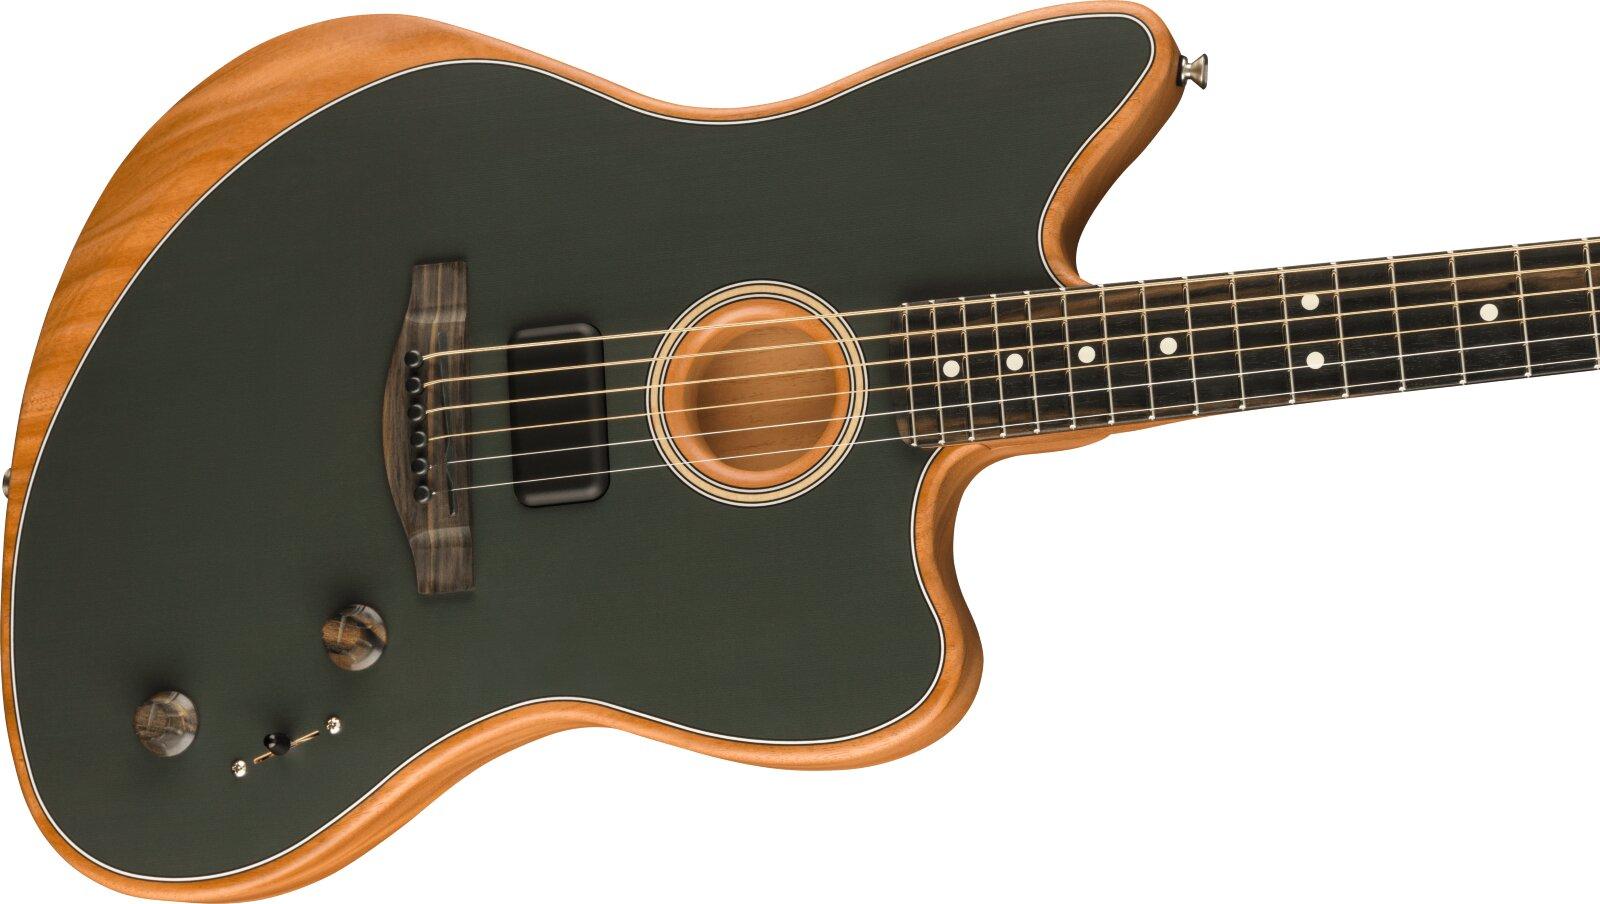 Fender American Acoustasonic Jazzmaster Tungsen Ebony Fingerboard : photo 3